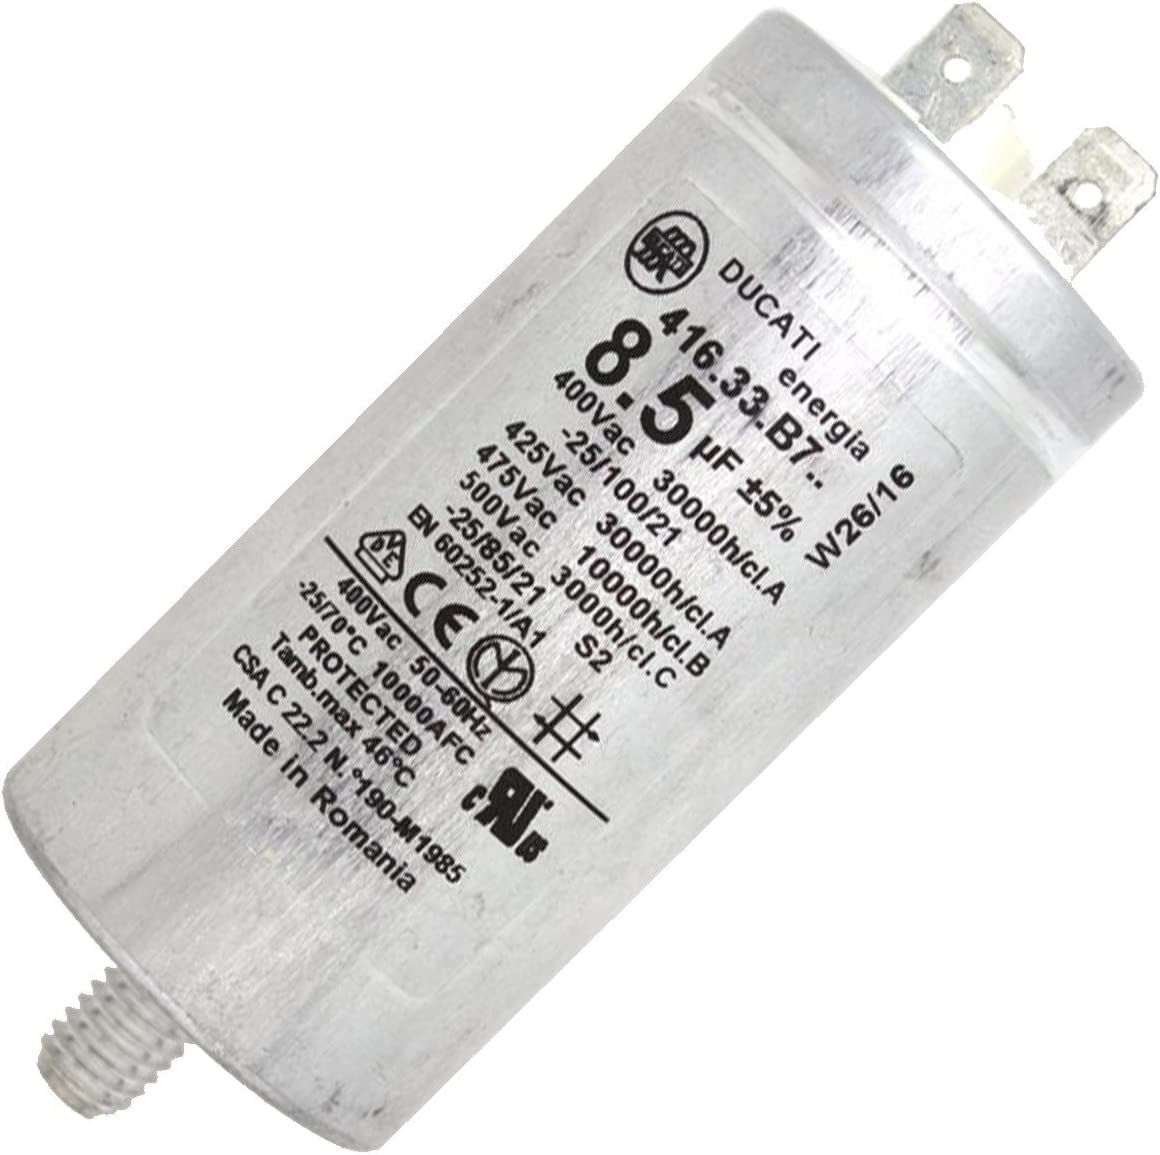 Condensador Permanent 8.5µf 400 V – Secadora – Ariston Hotpoint ...